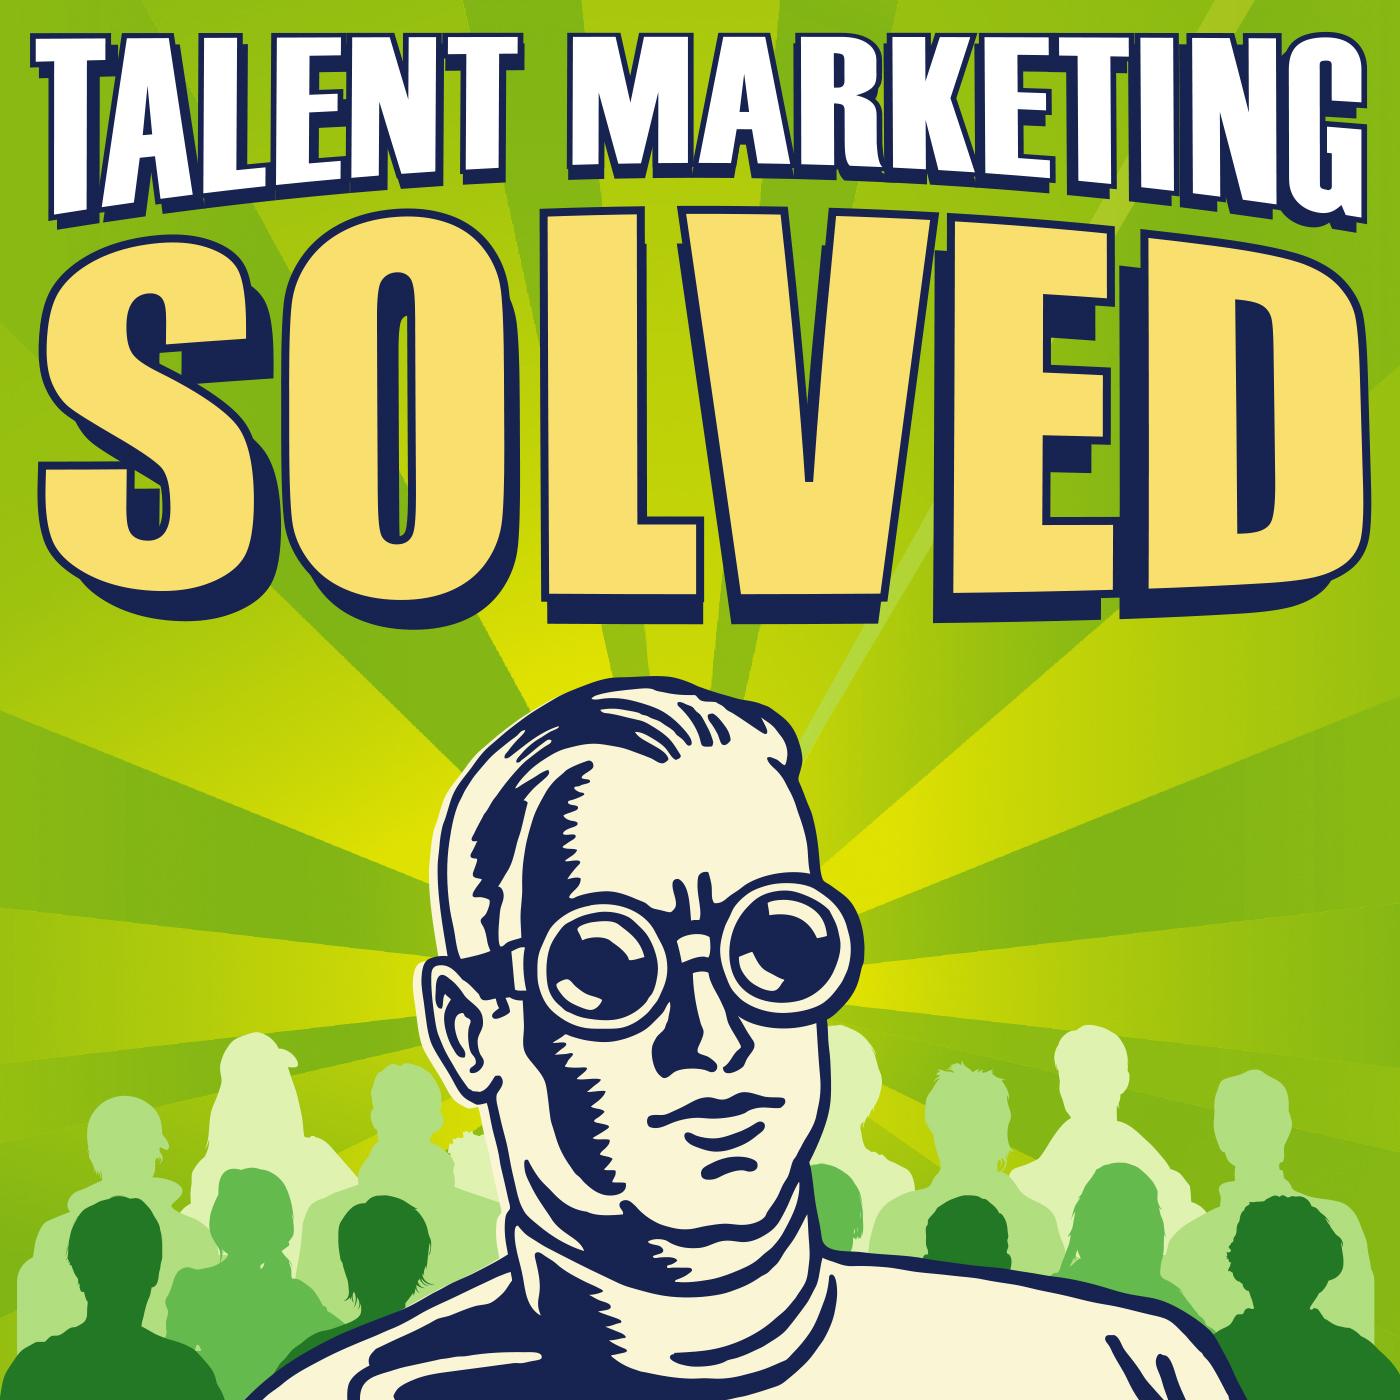 Talent Marketing Solved